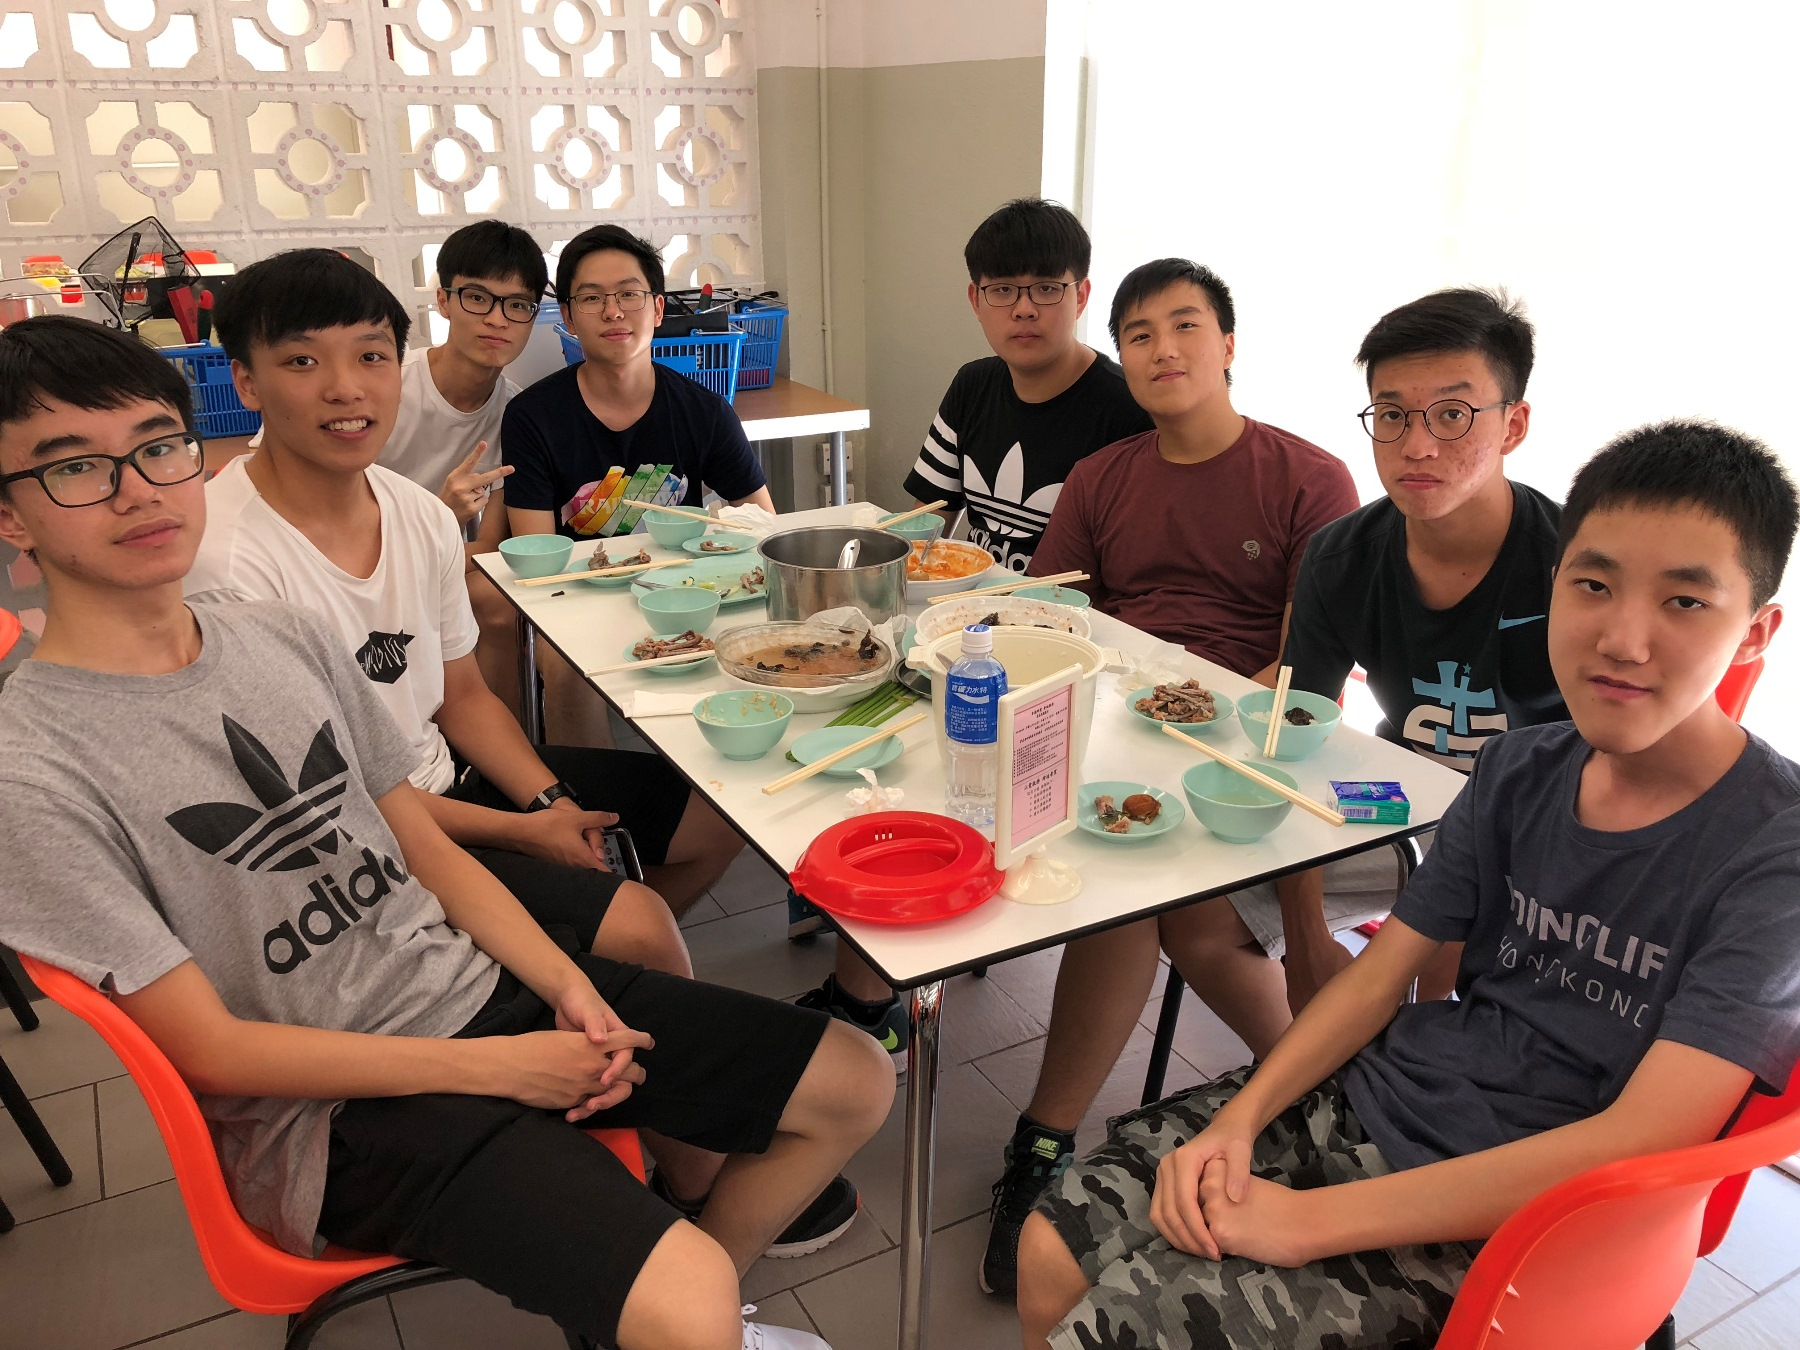 http://npc.edu.hk/sites/default/files/4_1119.jpg